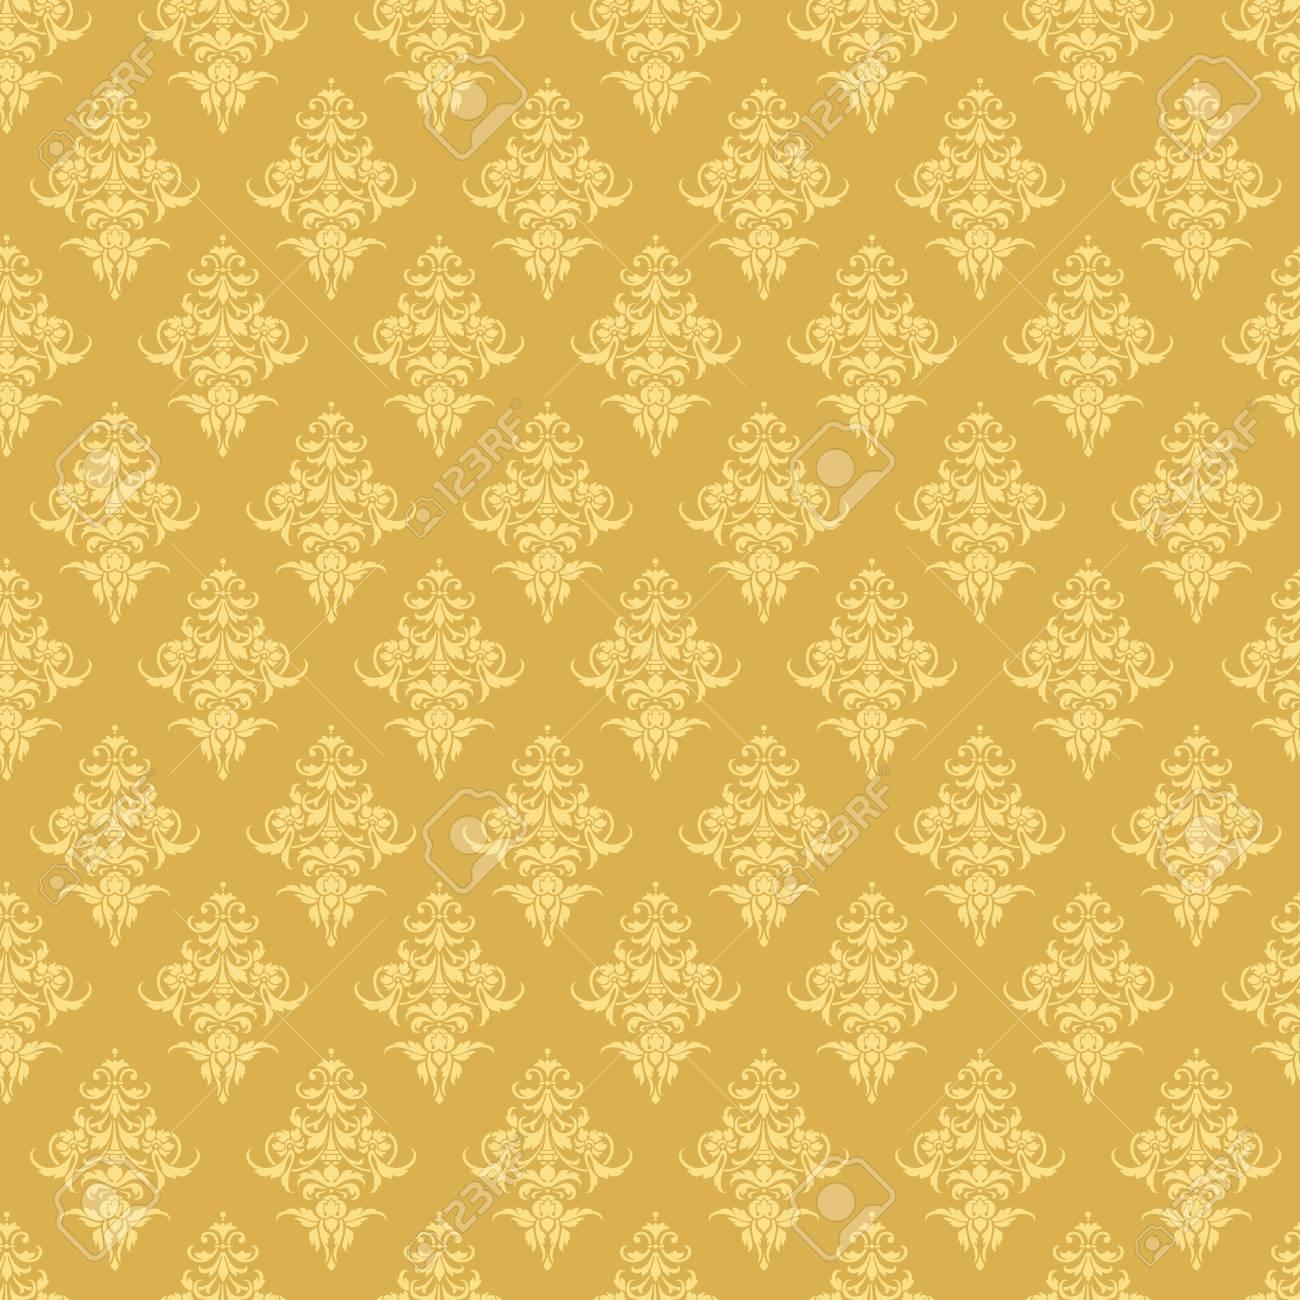 Luxury Seamless Golden Floral Wallpaper Vector Pattern For Design